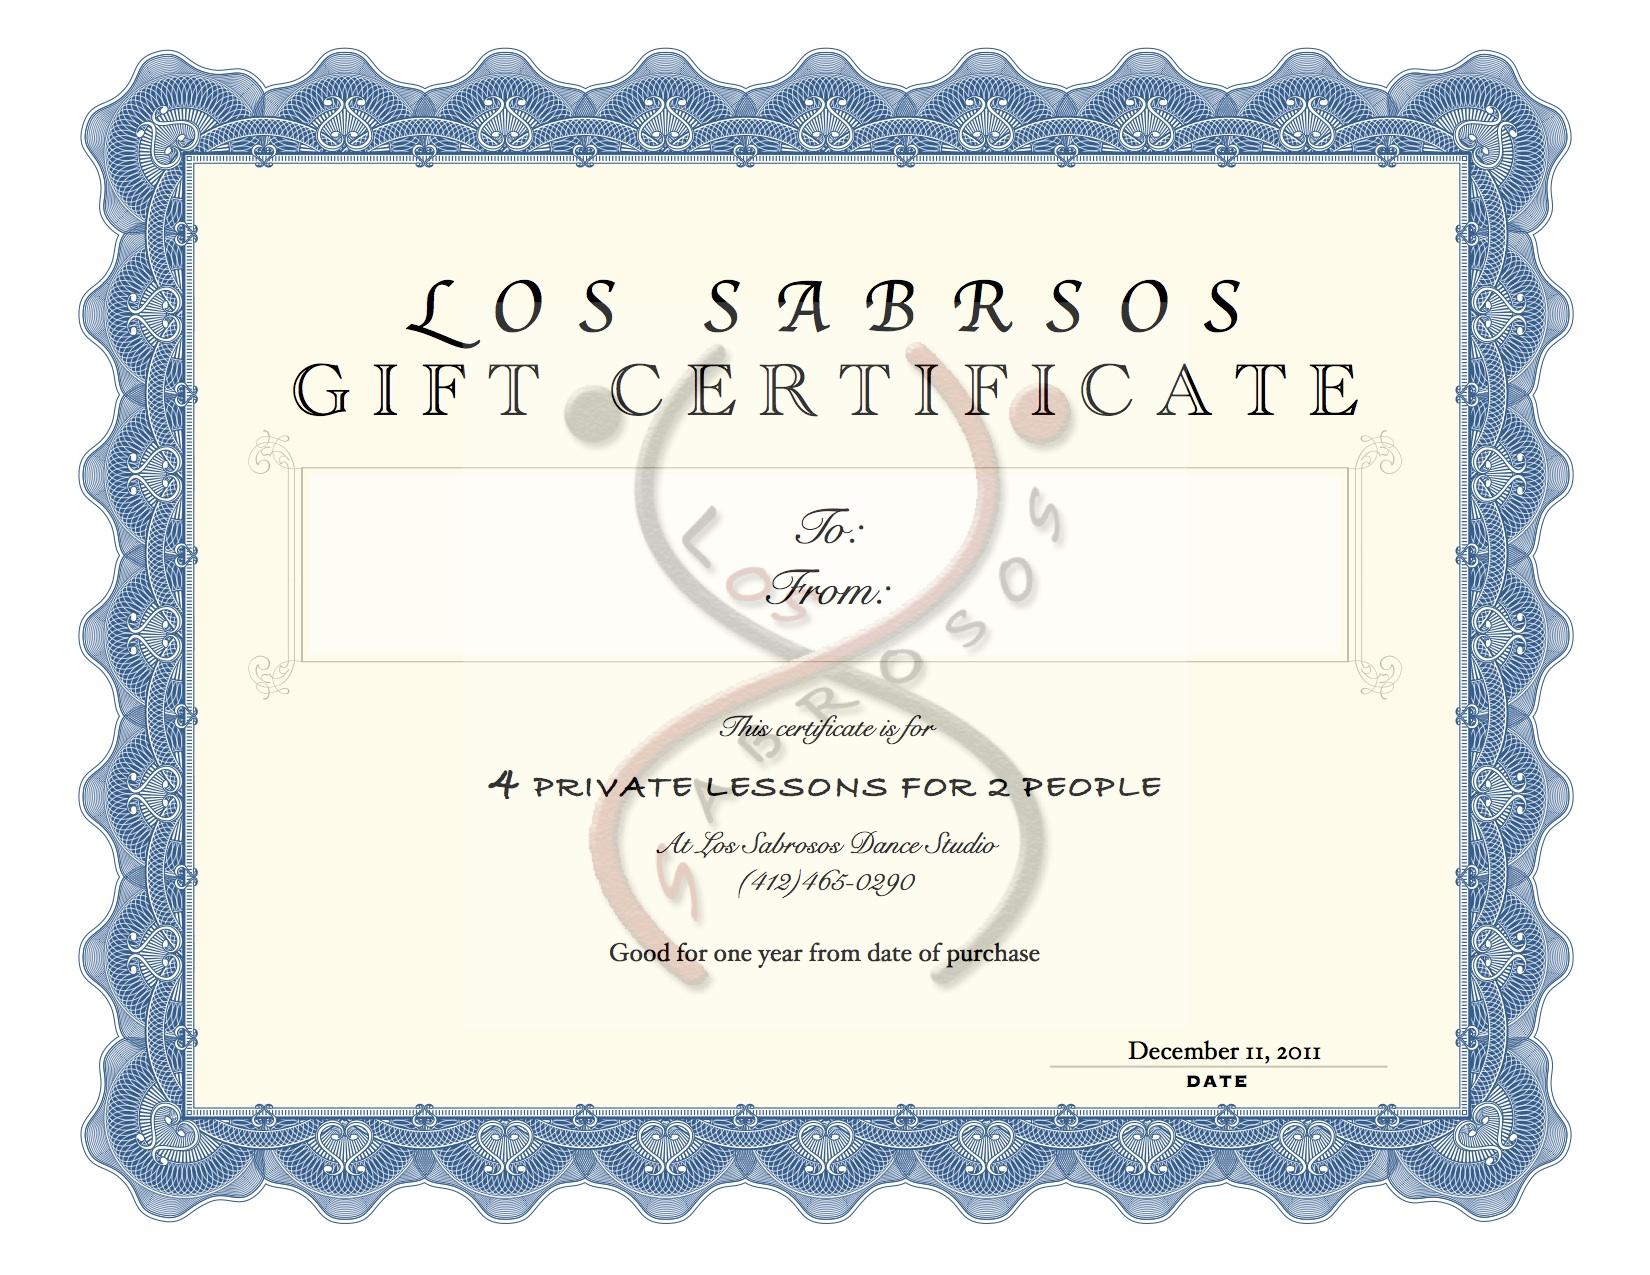 Ssl Certificates House Of Brides 103